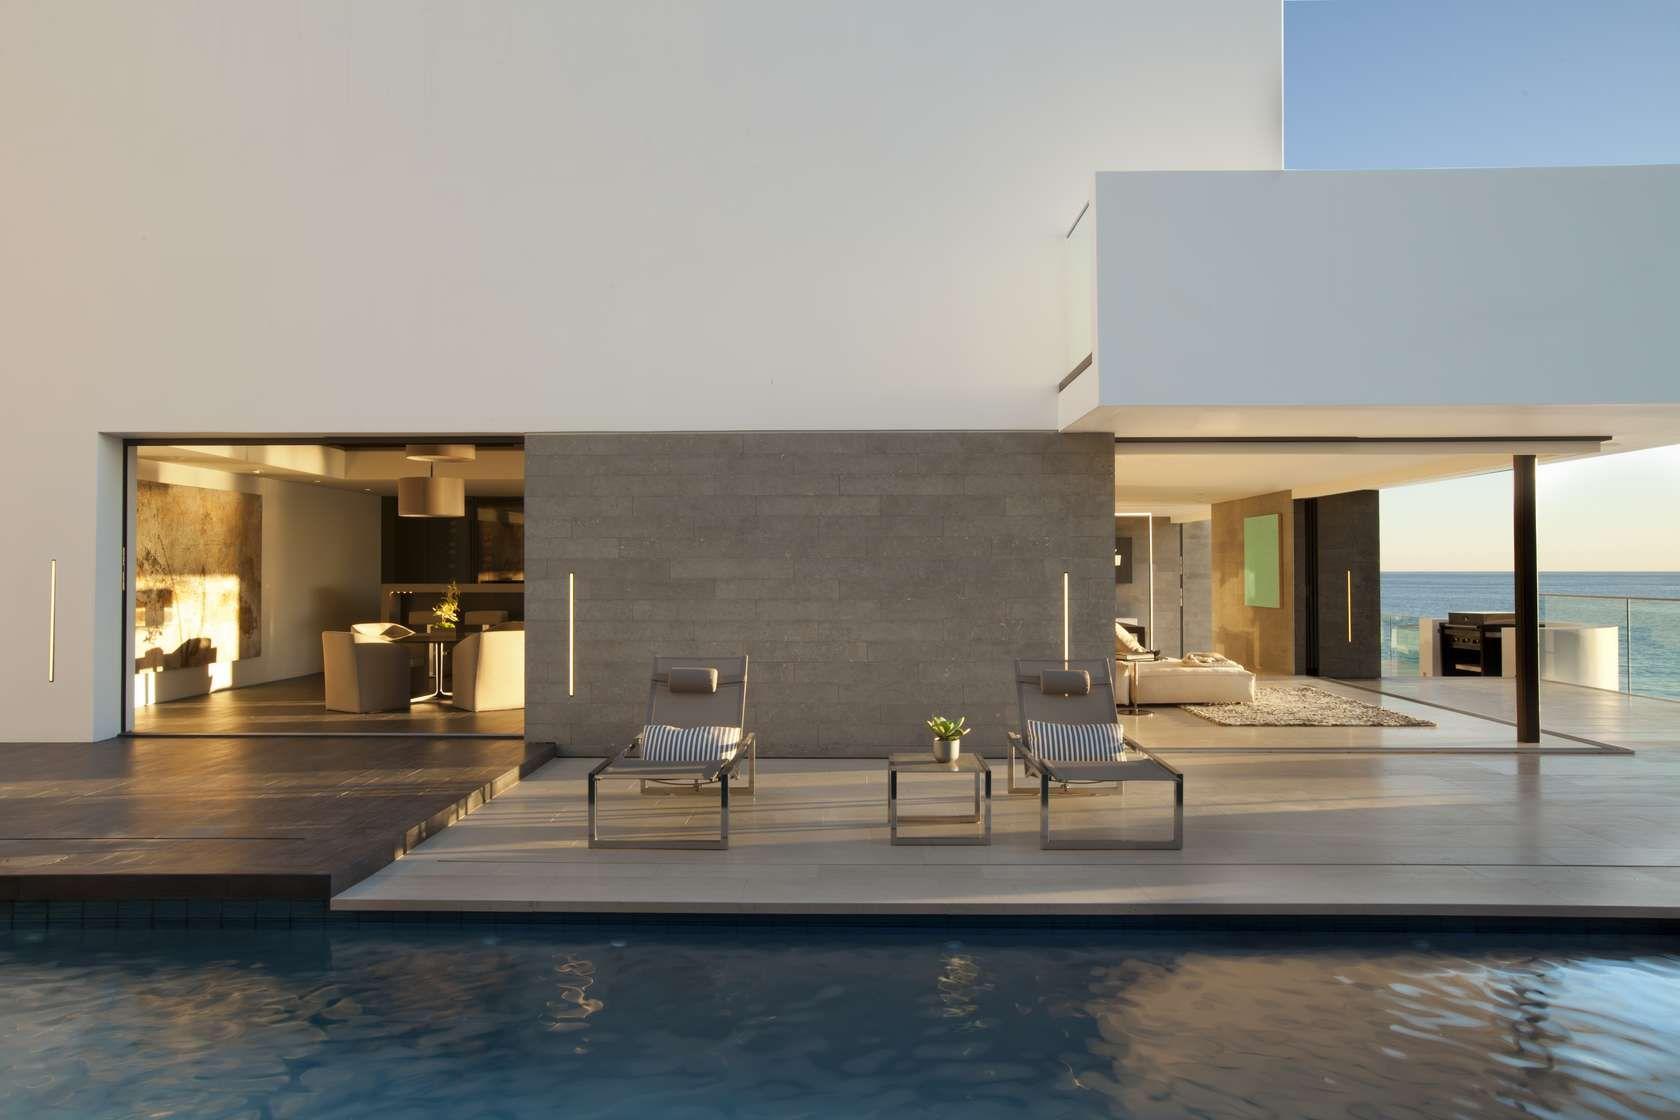 Rockledge Laguna Beach, CA, United States Horst Architects, Inc.